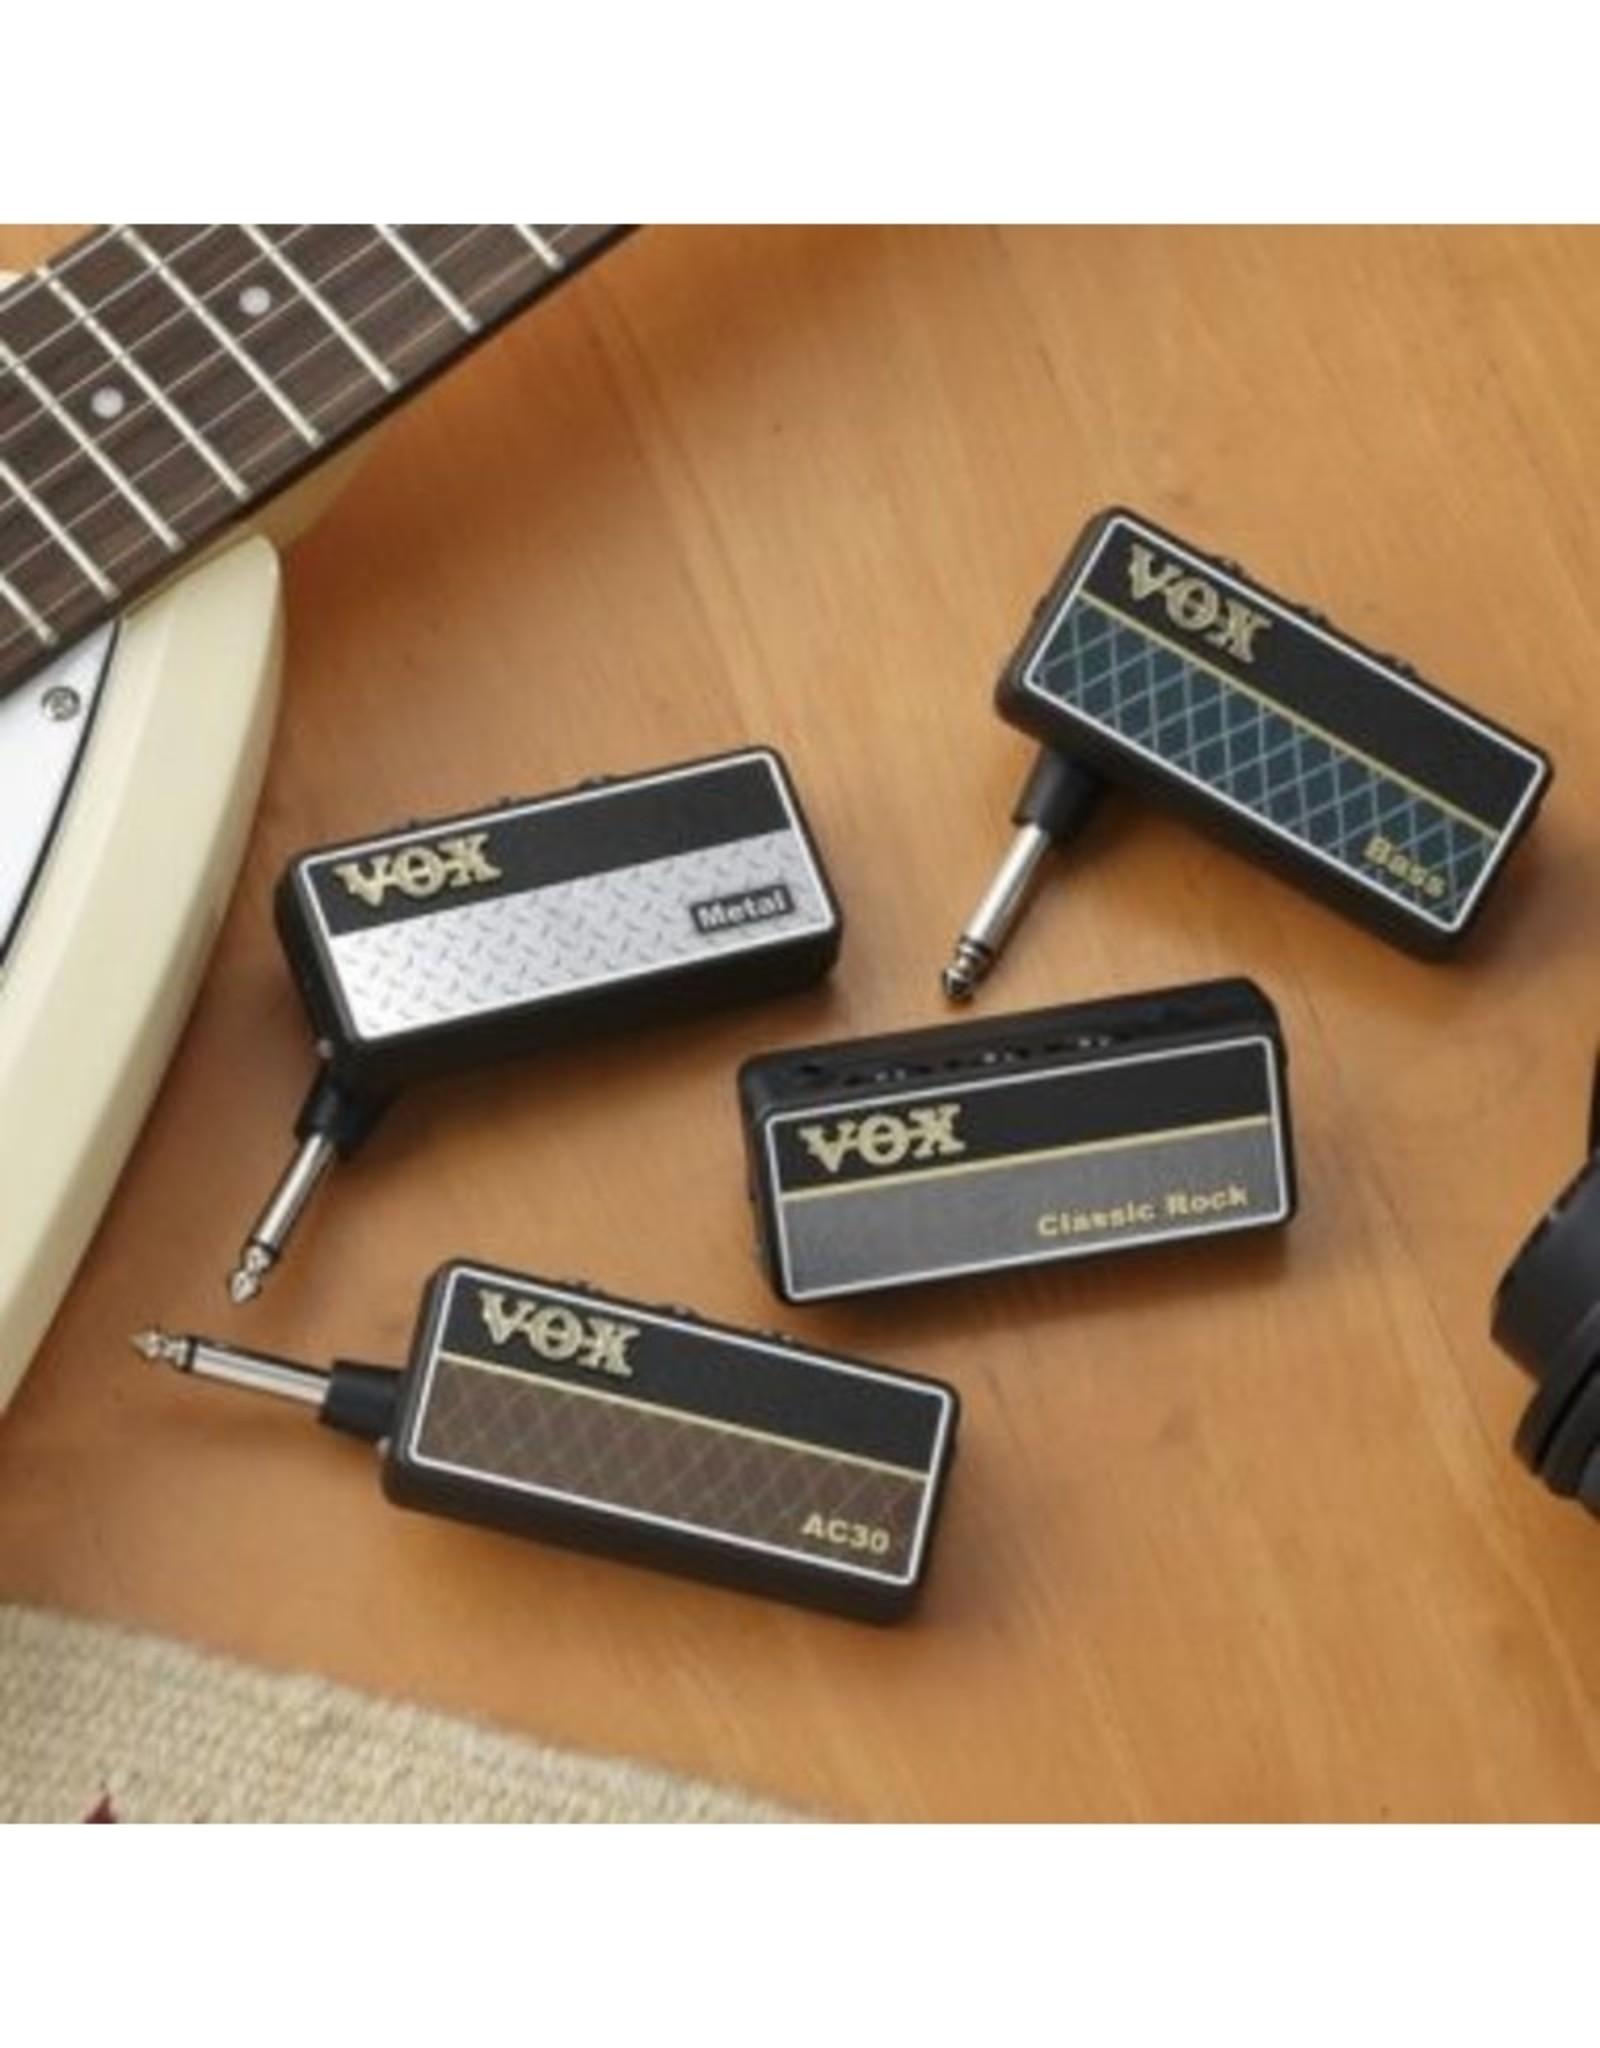 Vox Vox Amplug 2 Bass